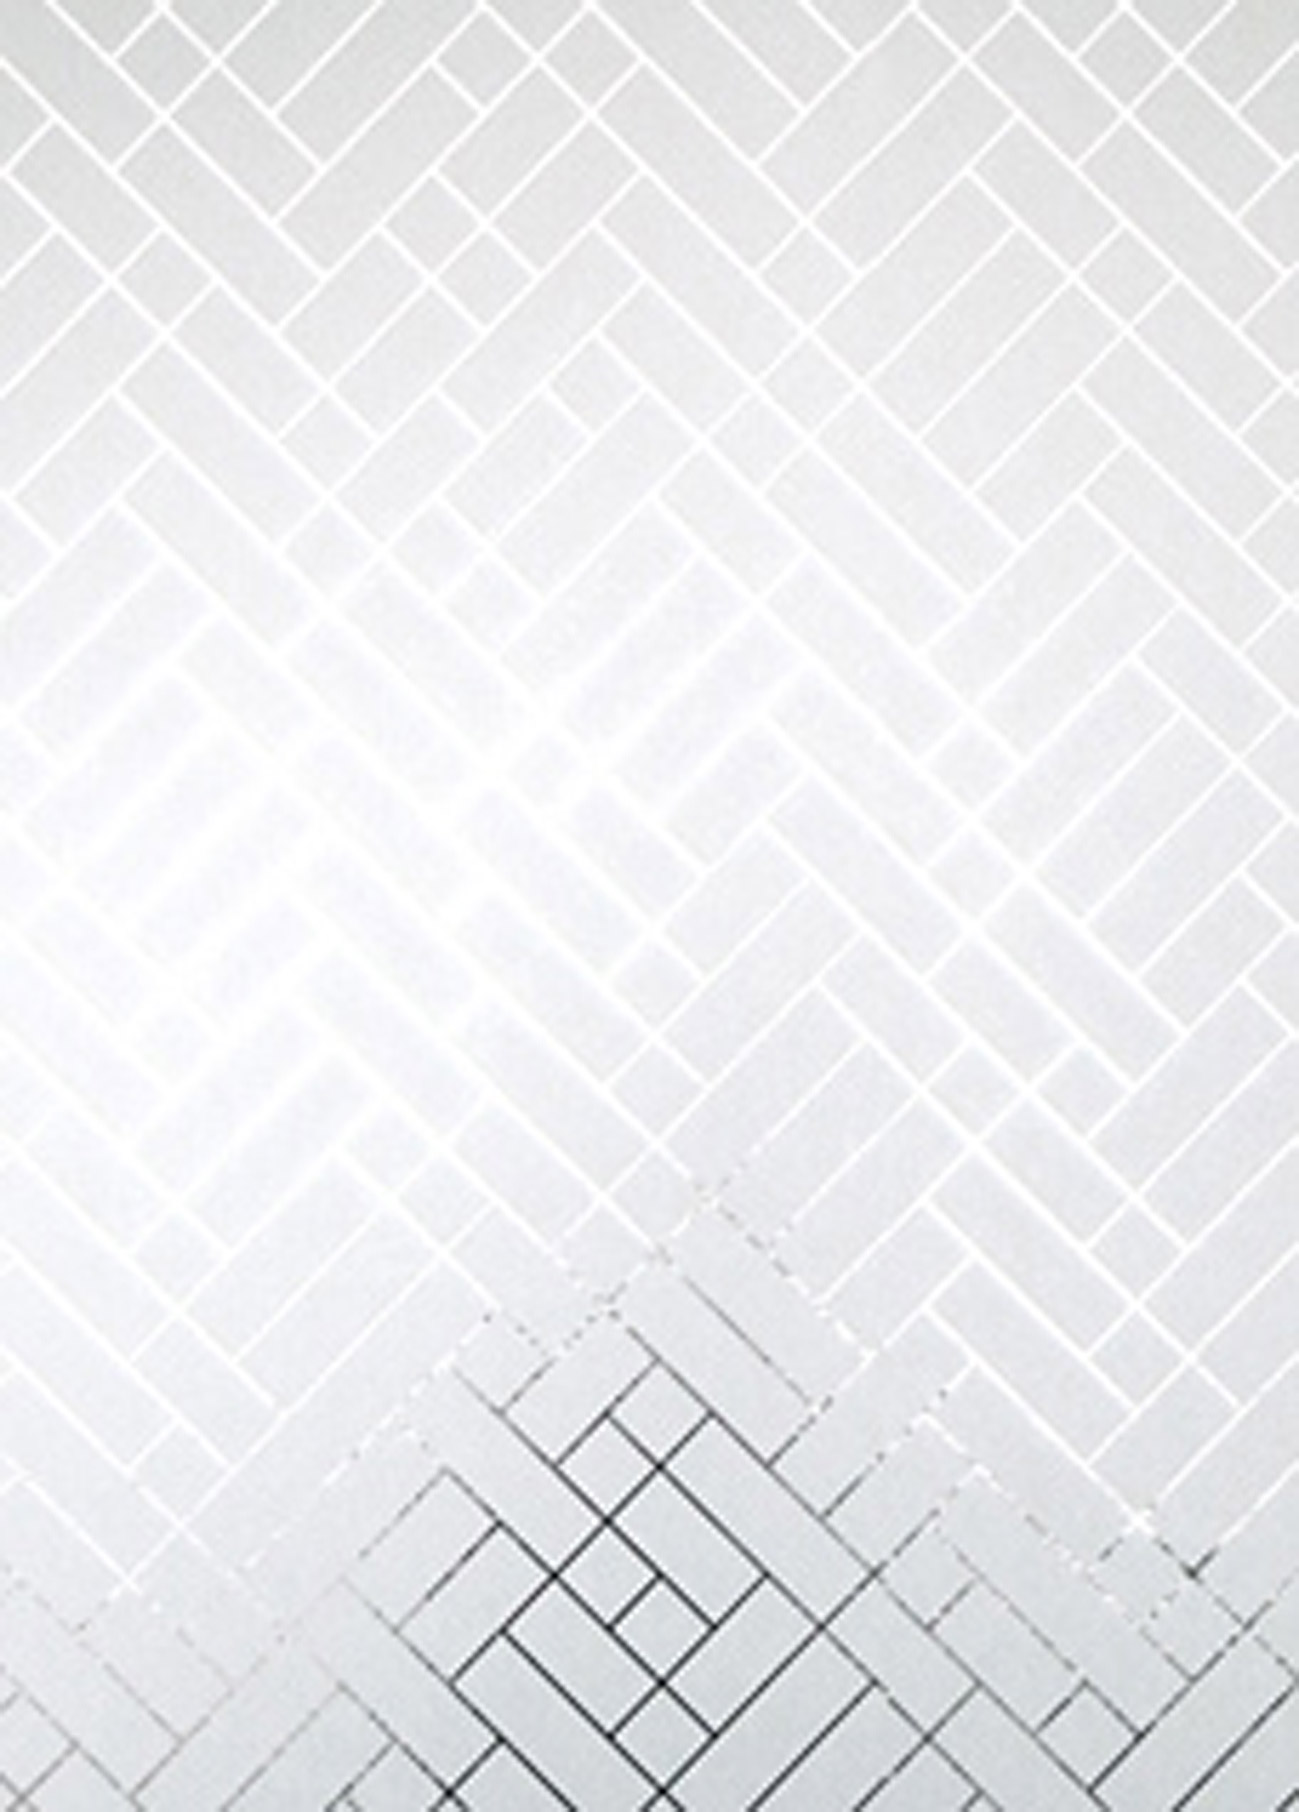 white and silver wallpaper wallpapersafari. Black Bedroom Furniture Sets. Home Design Ideas